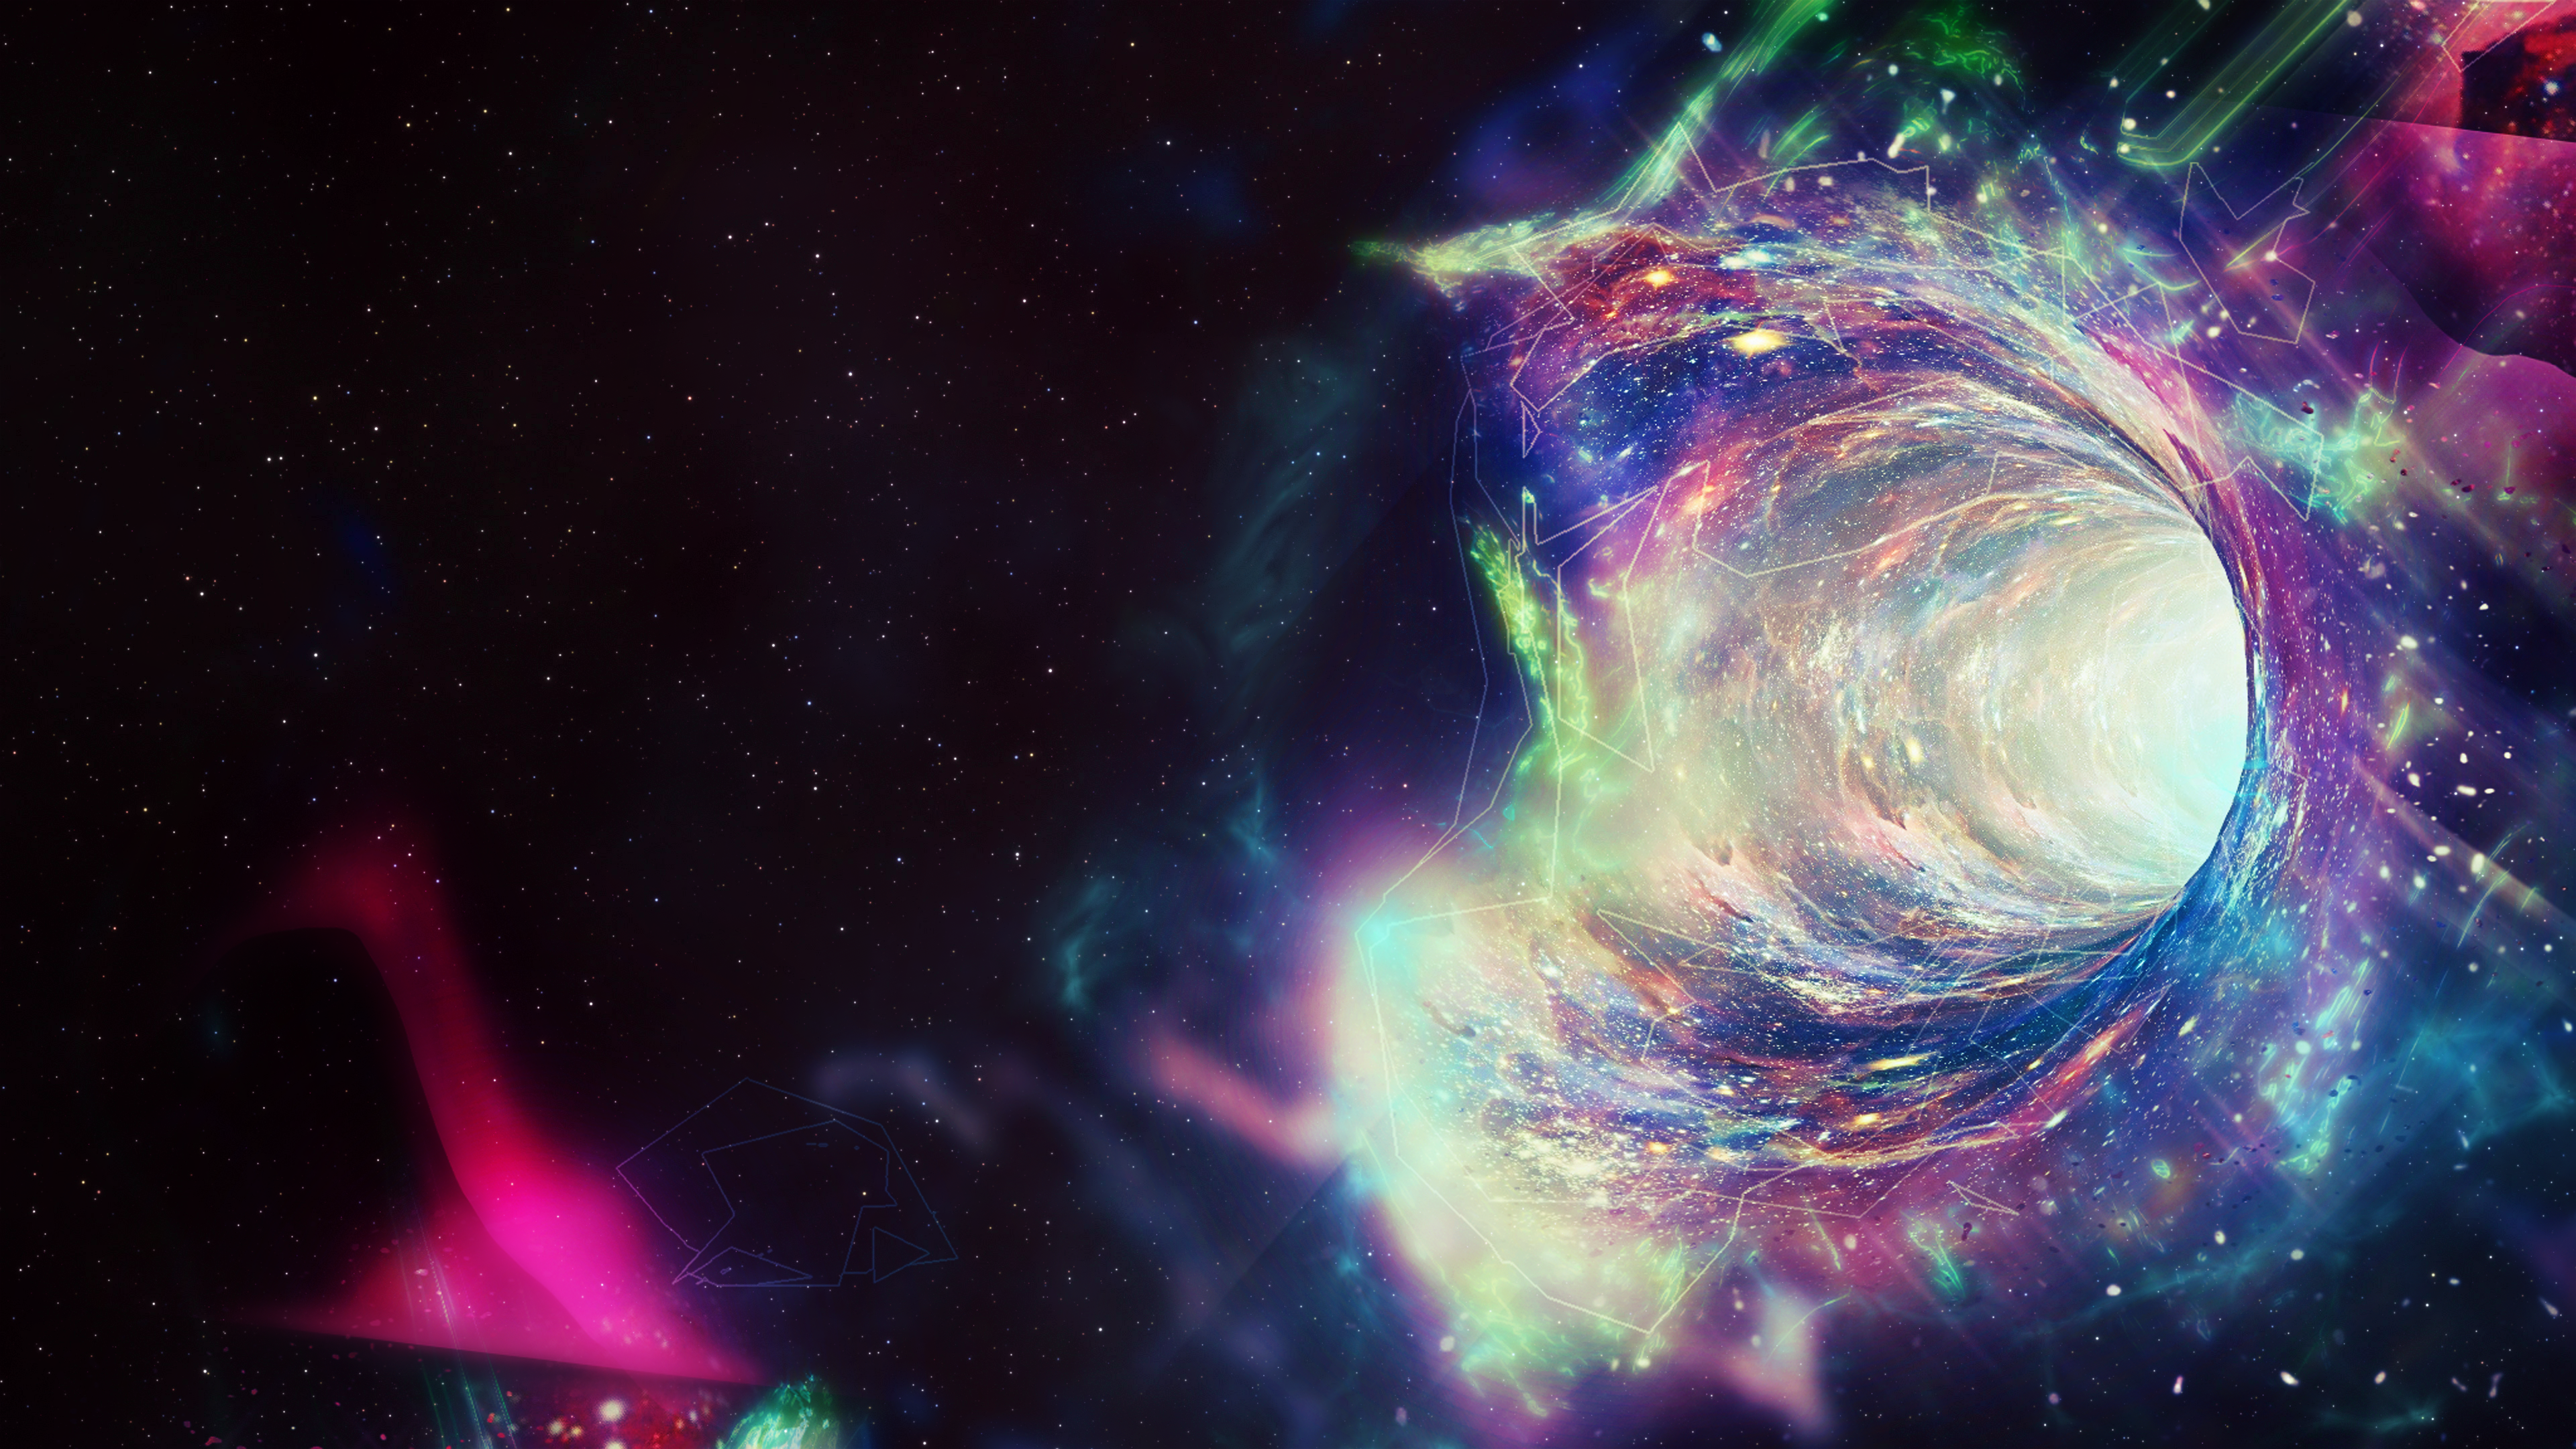 Black Hole 128k Wallpapers Top Free Black Hole 128k Backgrounds